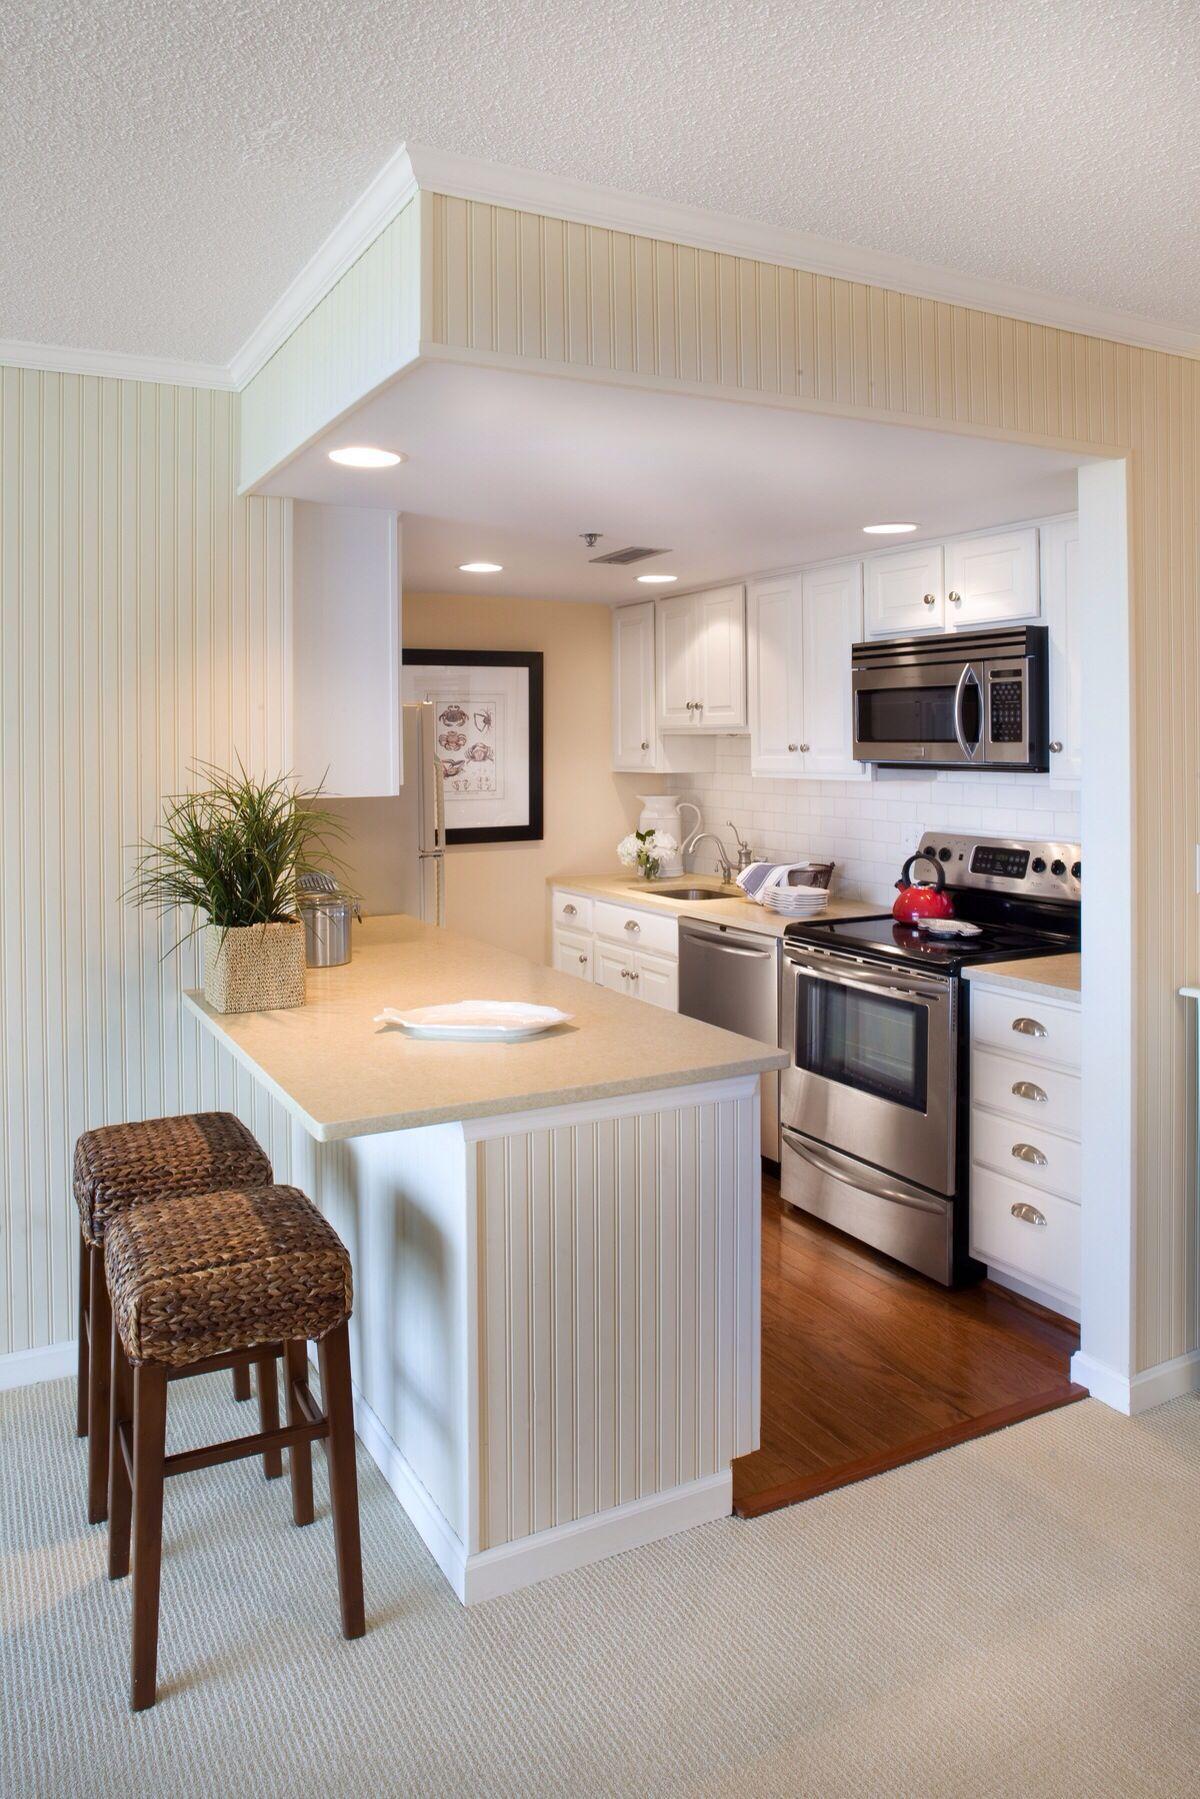 Small Apartment Kitchen With Island Decoomo